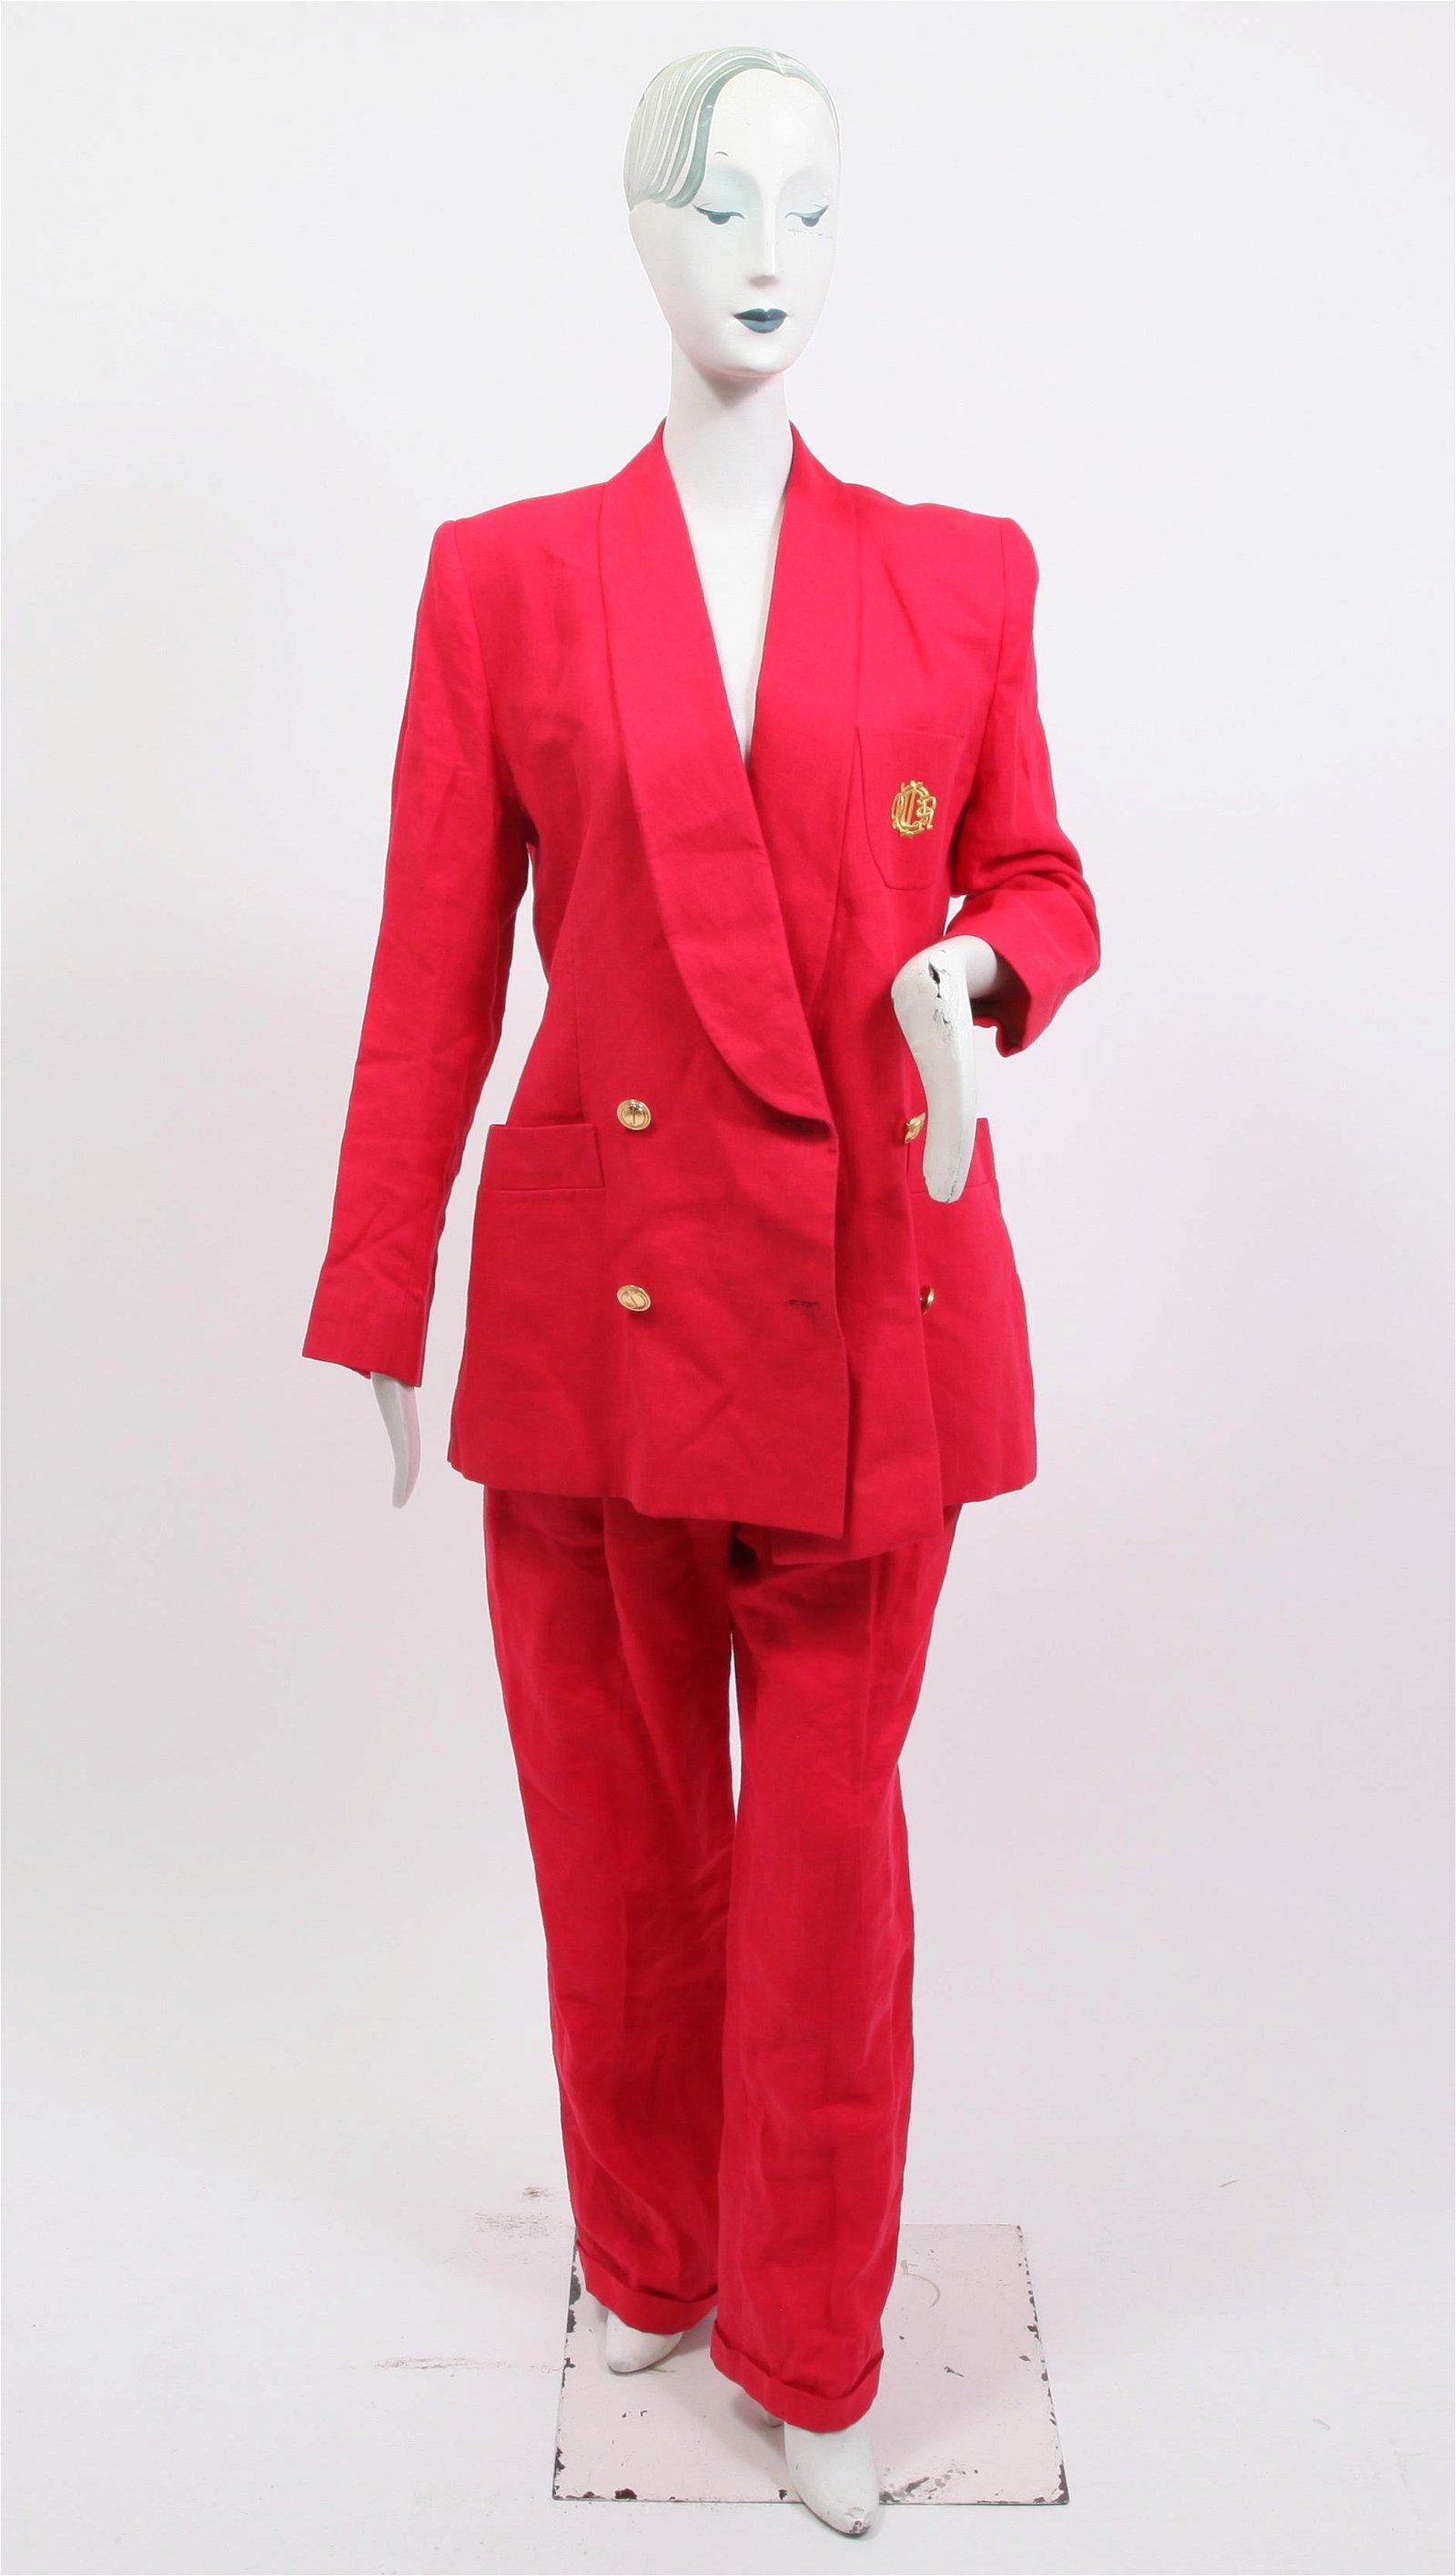 Christian Dior Vintage Red Linen Suit